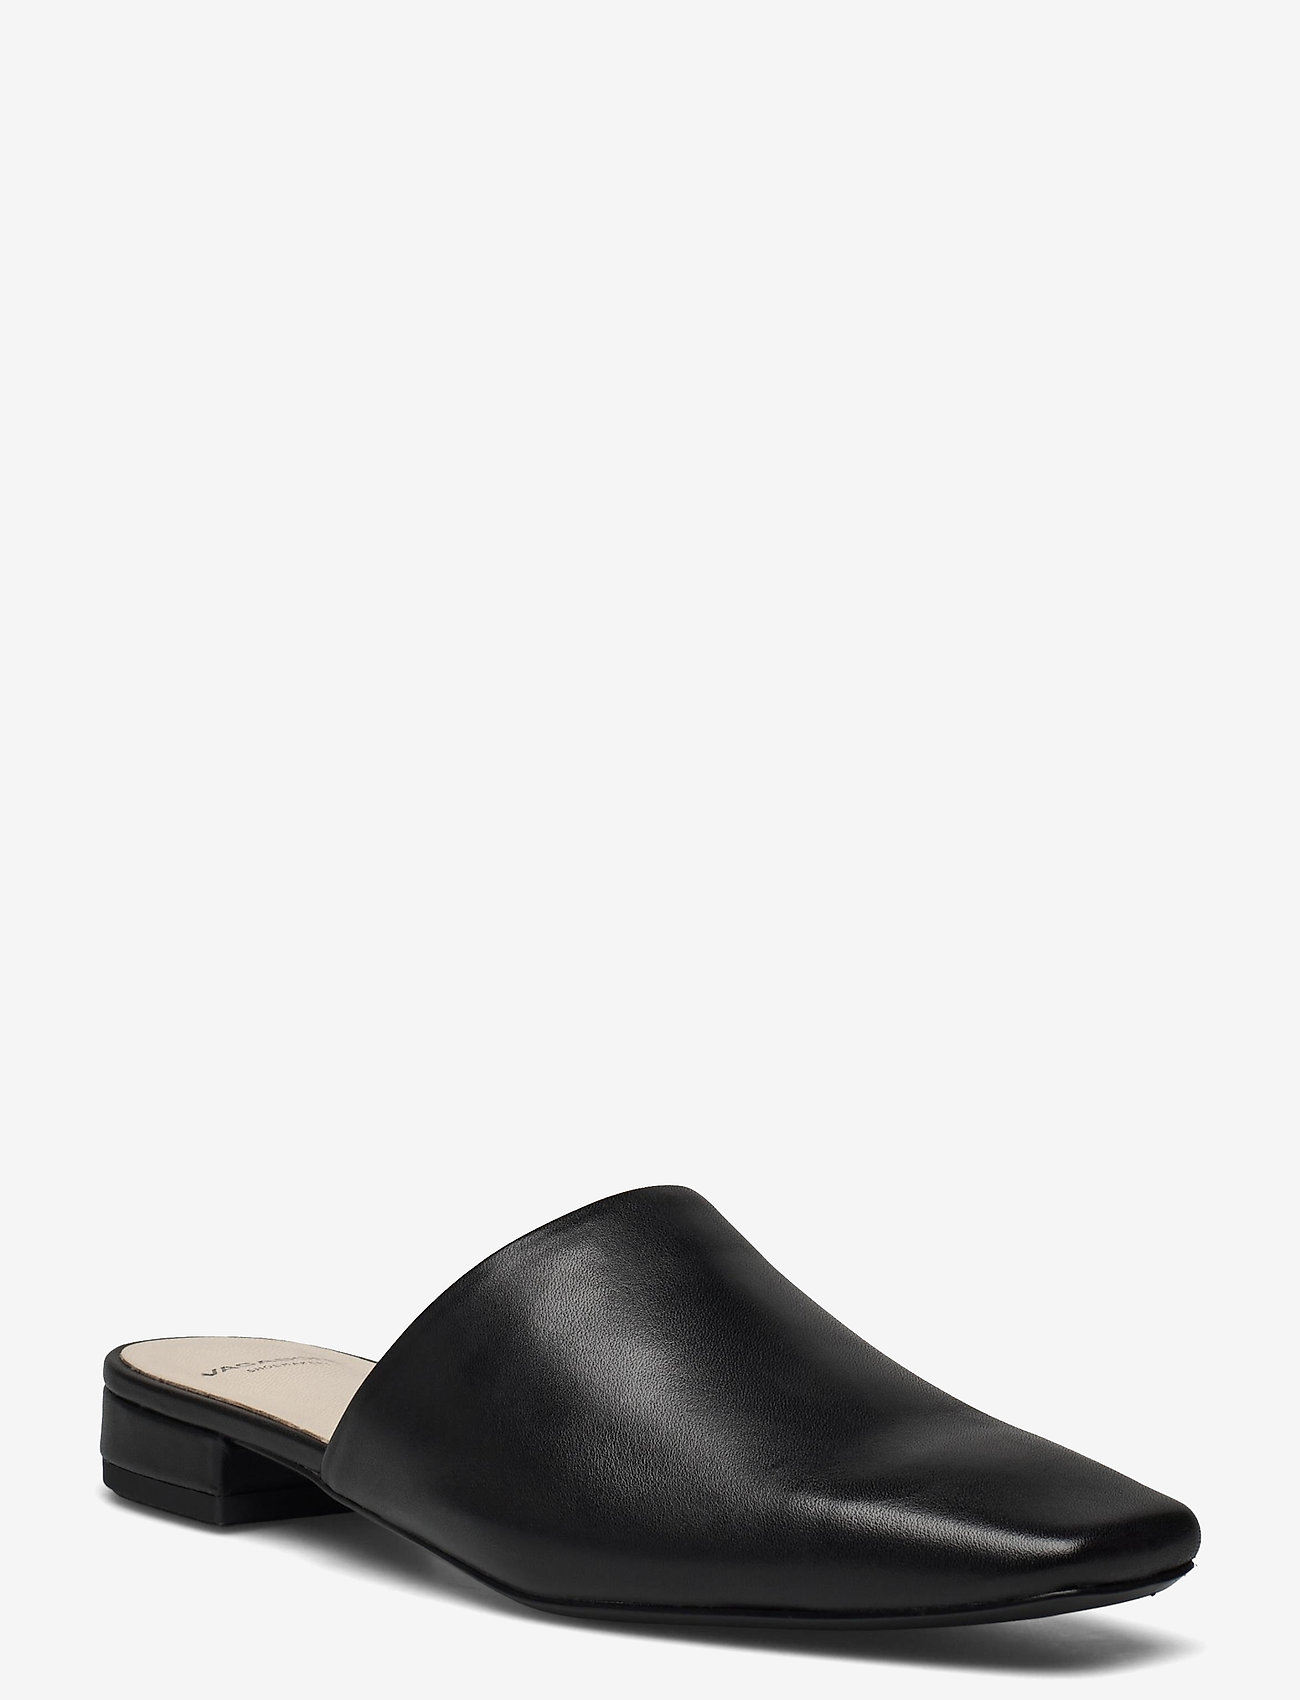 VAGABOND - LAYLA - mules & slipins - black - 1